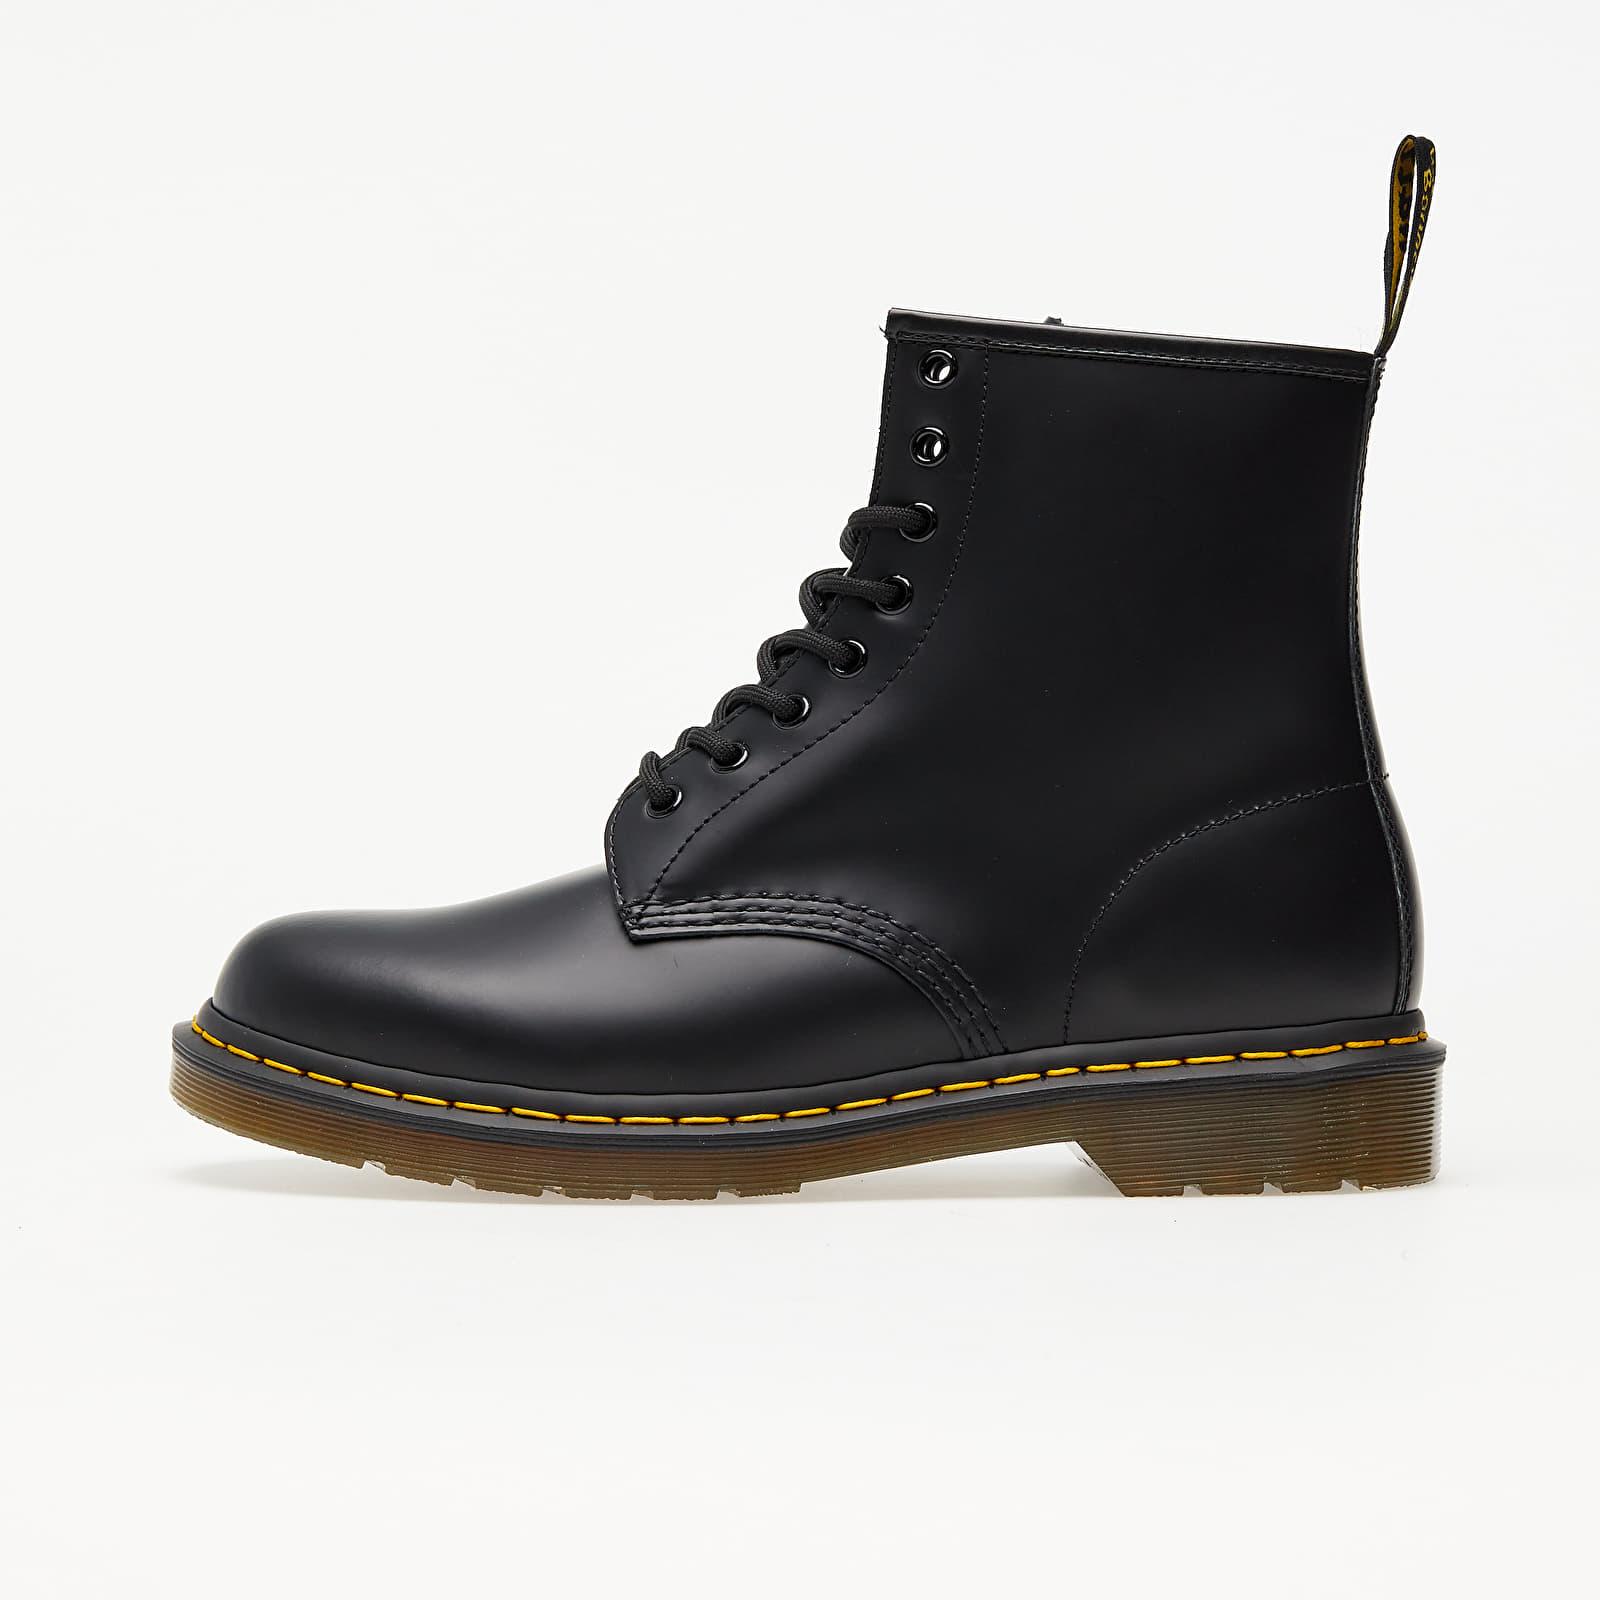 Férfi cipők Dr. Martens 1460 Smooth Black